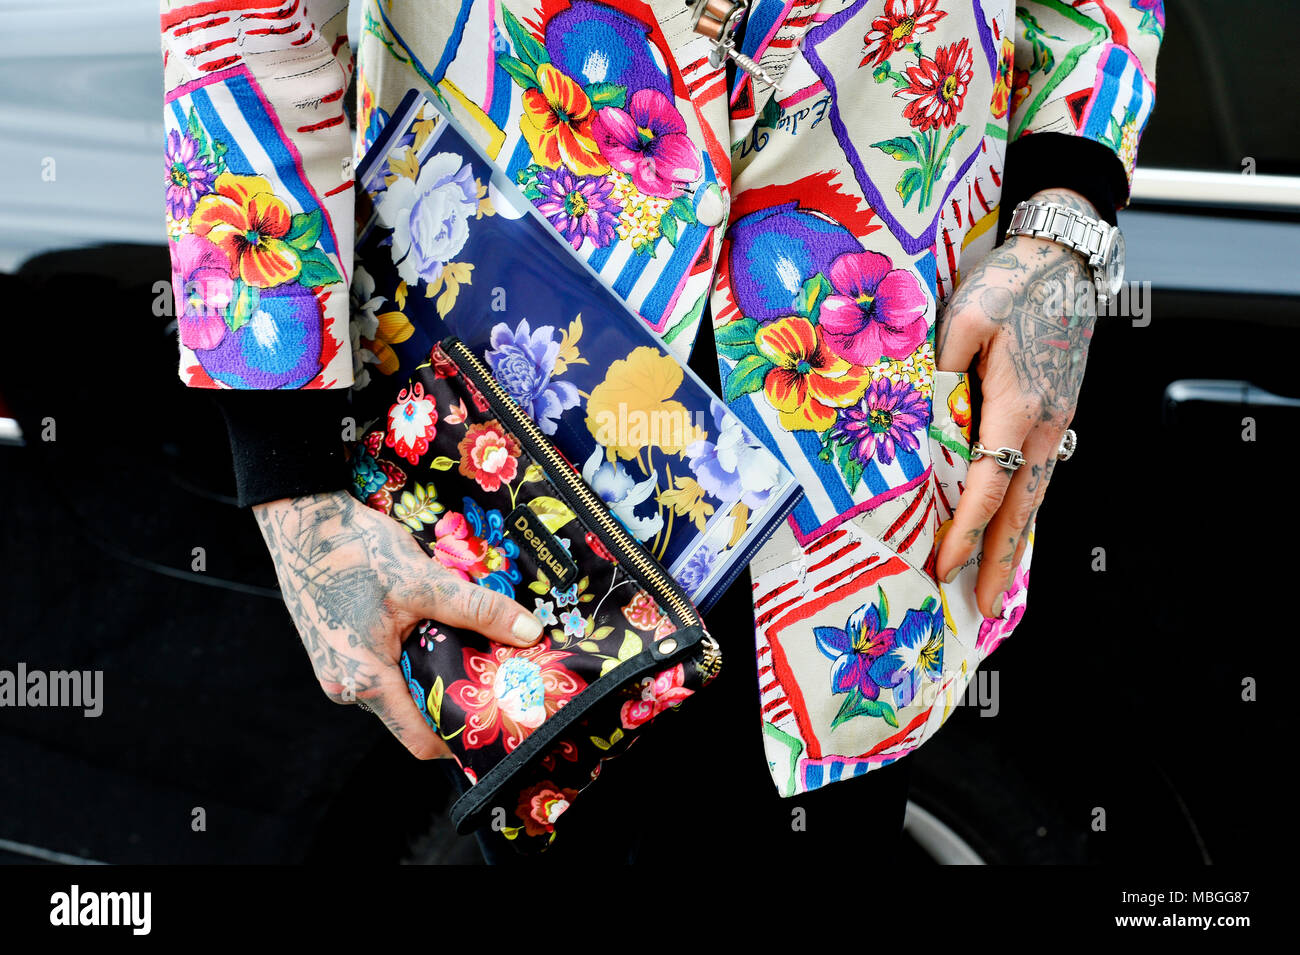 Chris Lavish -  Paris Fashion Week RTW FW 2018/2019 - Paris - France - Stock Image